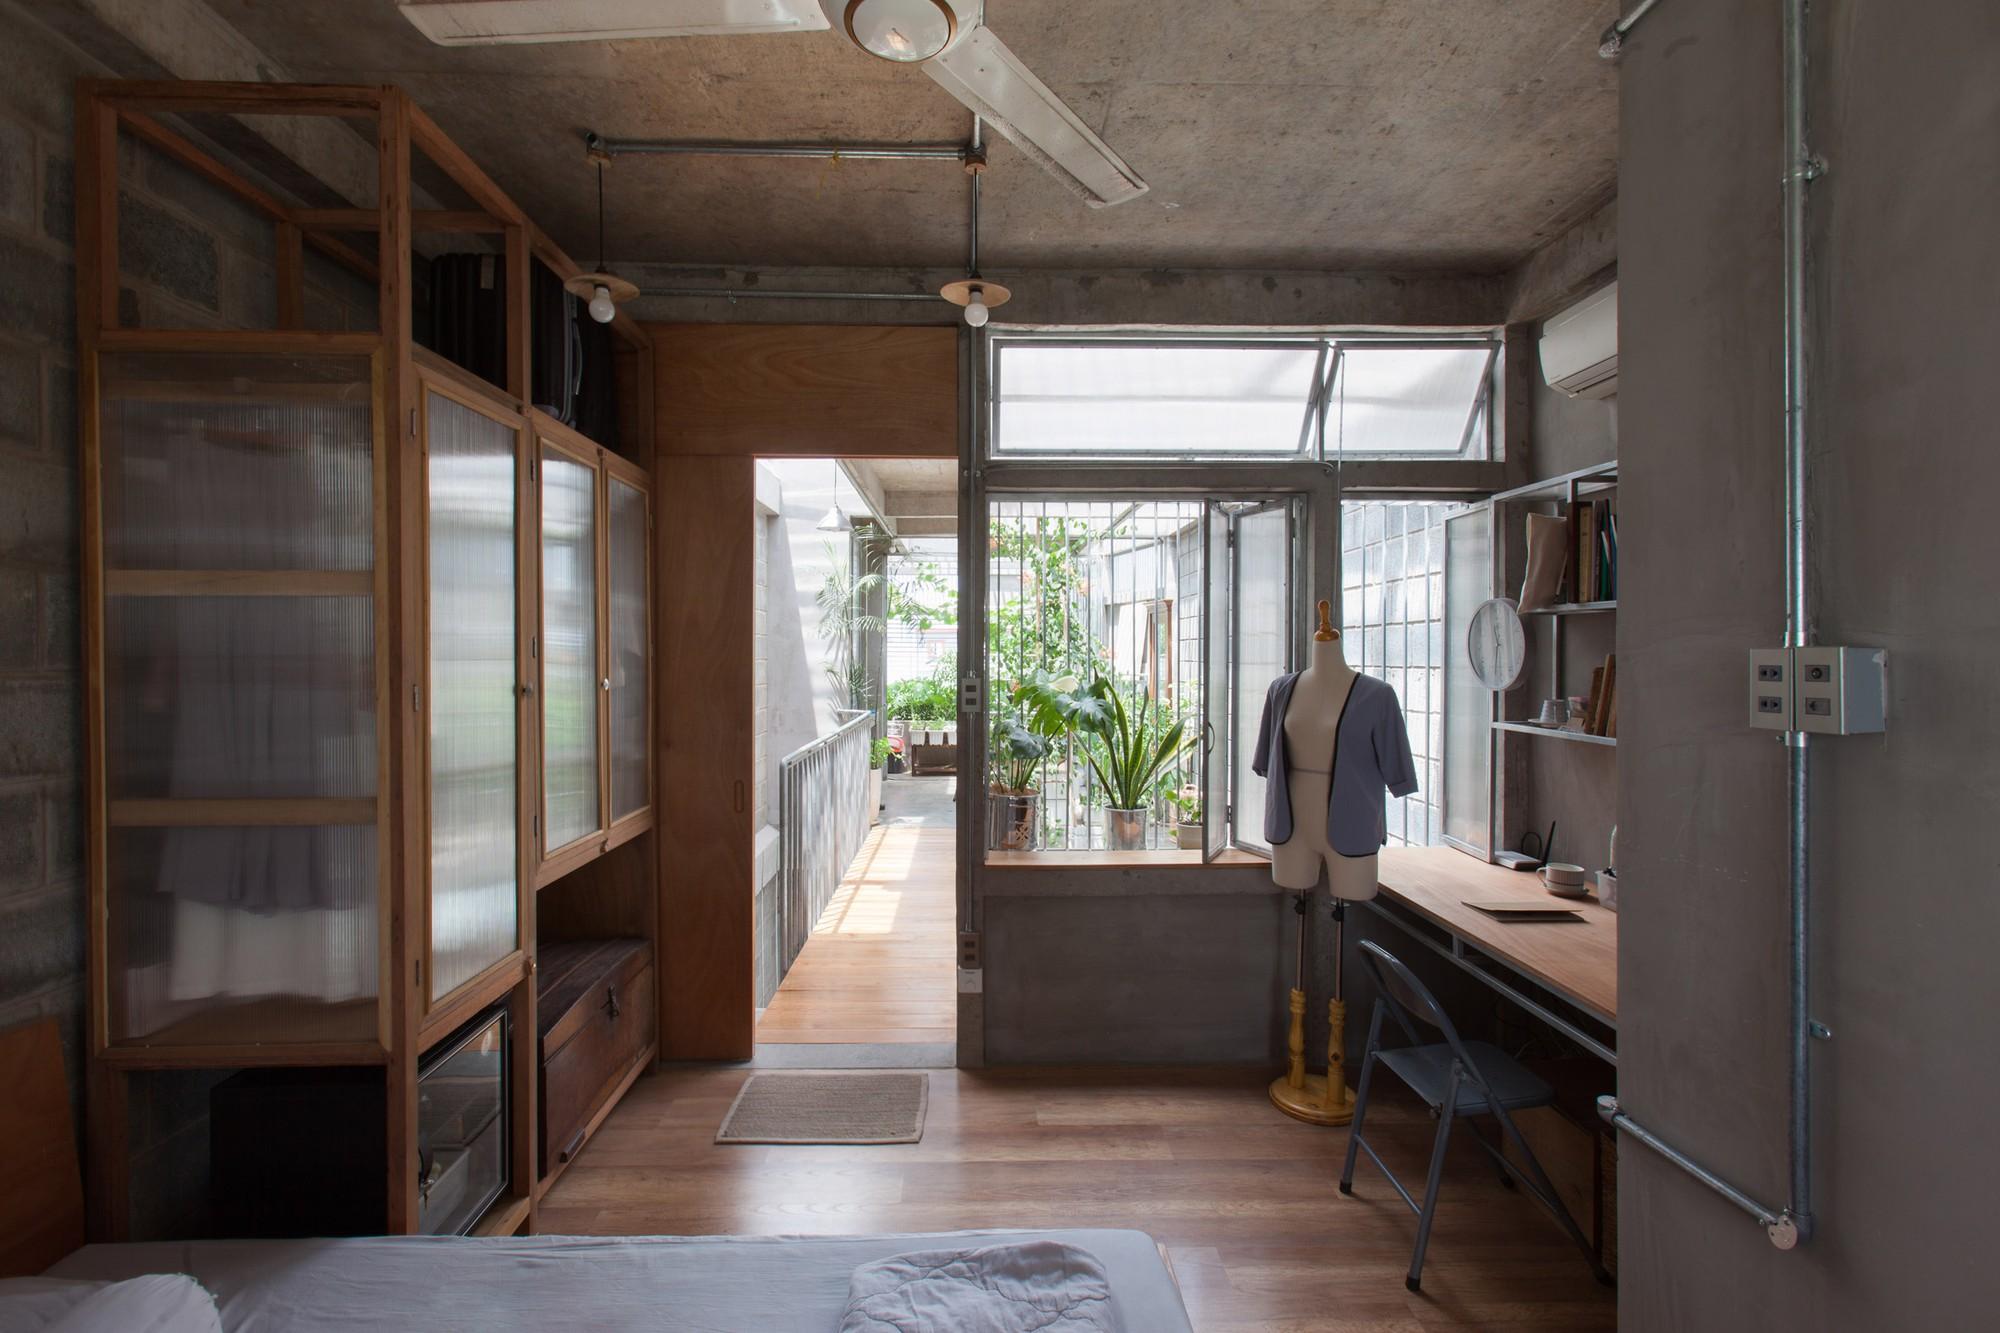 k59-atelier-home-studio-architecture-residential-self-designed-studios-vietnam_dezeen_2364_col_30